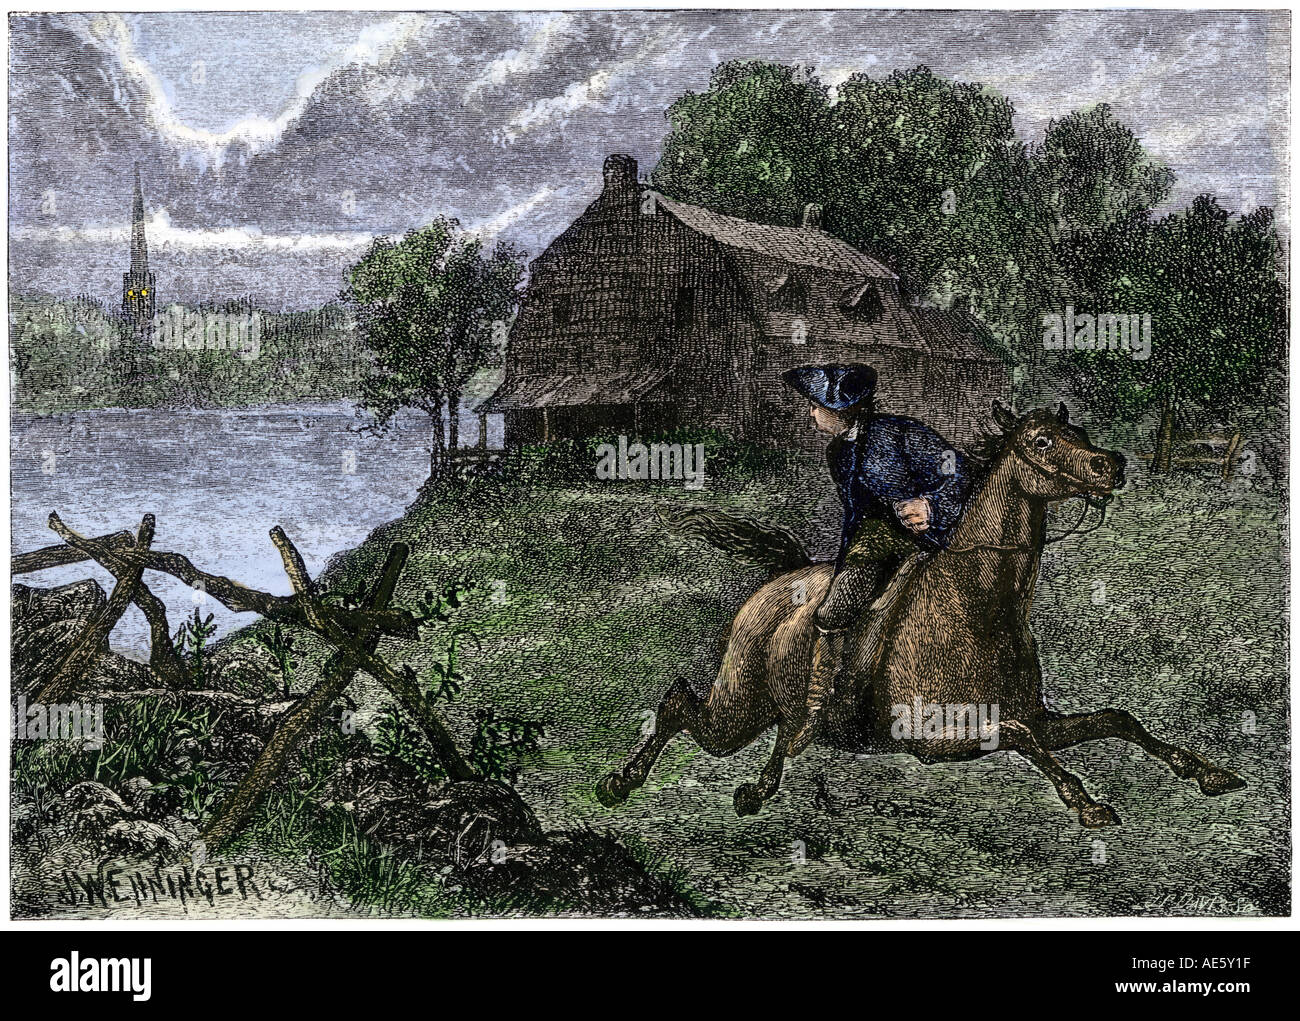 grant wood midnight ride of paul revere